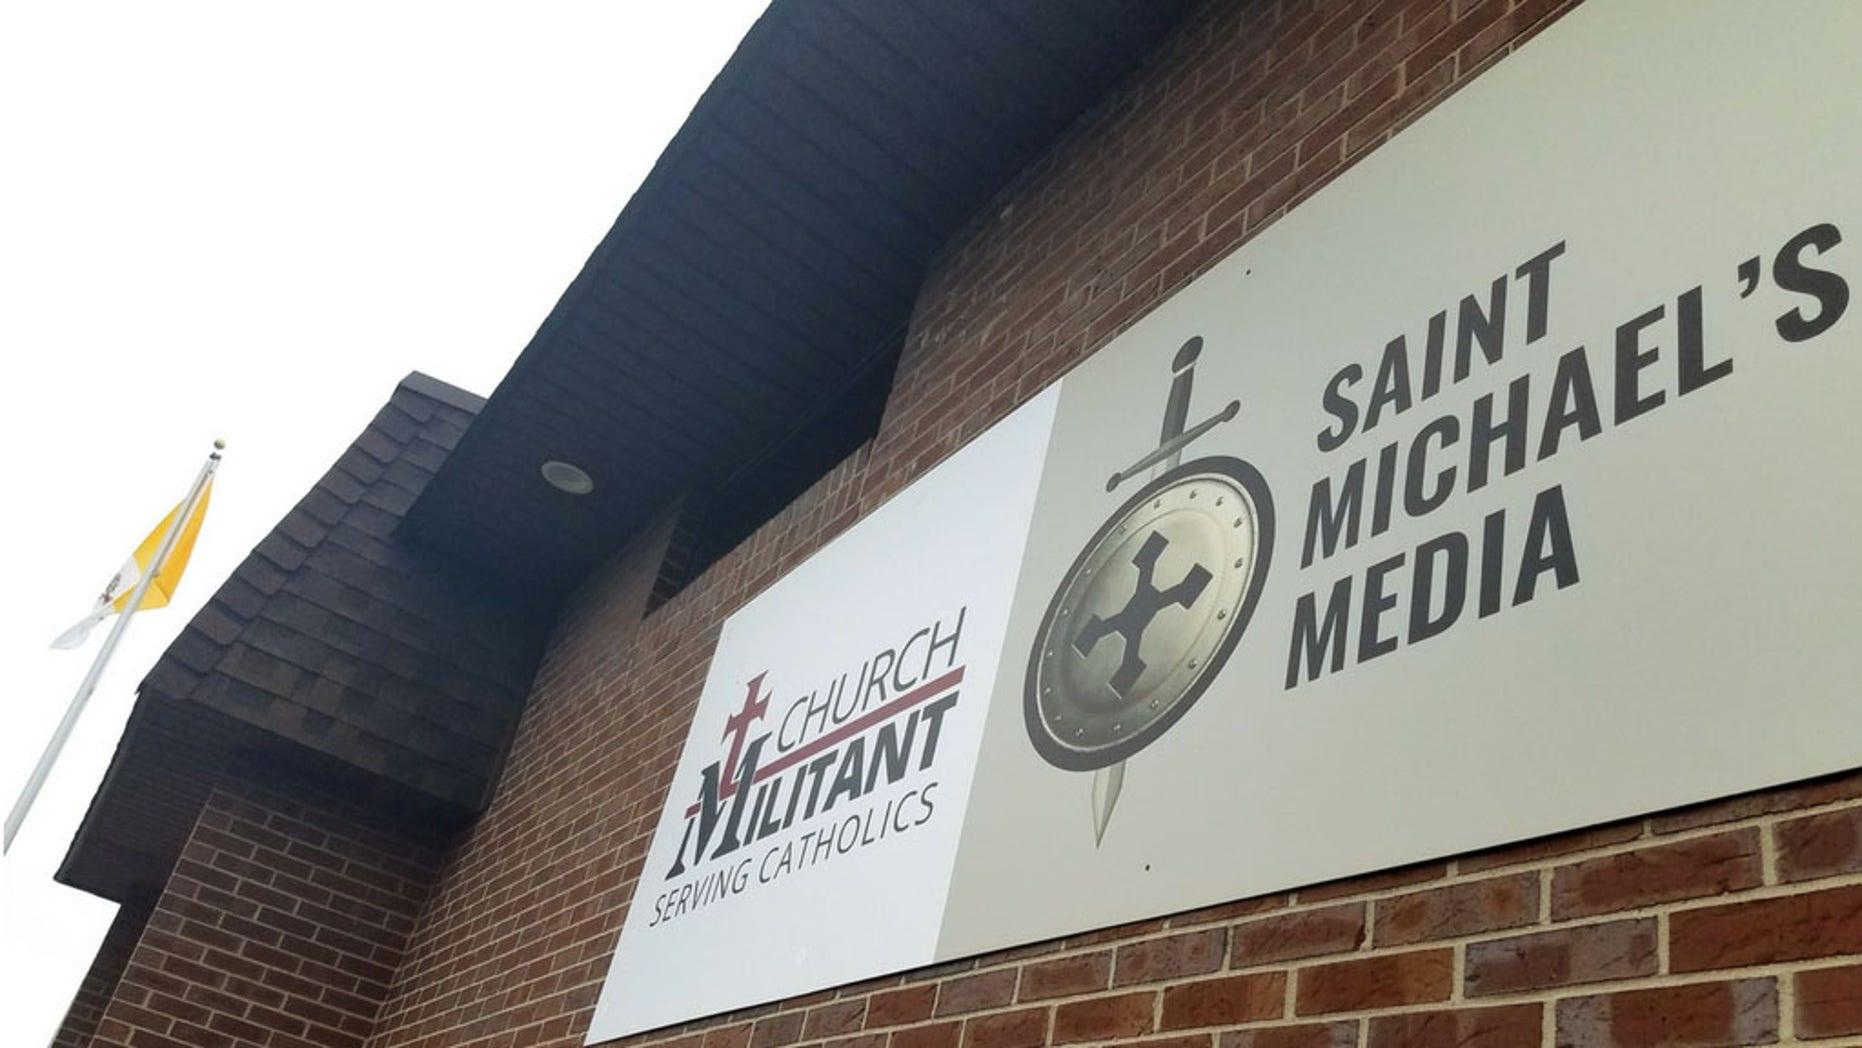 Outside Church Militant's headquarters in Michigan